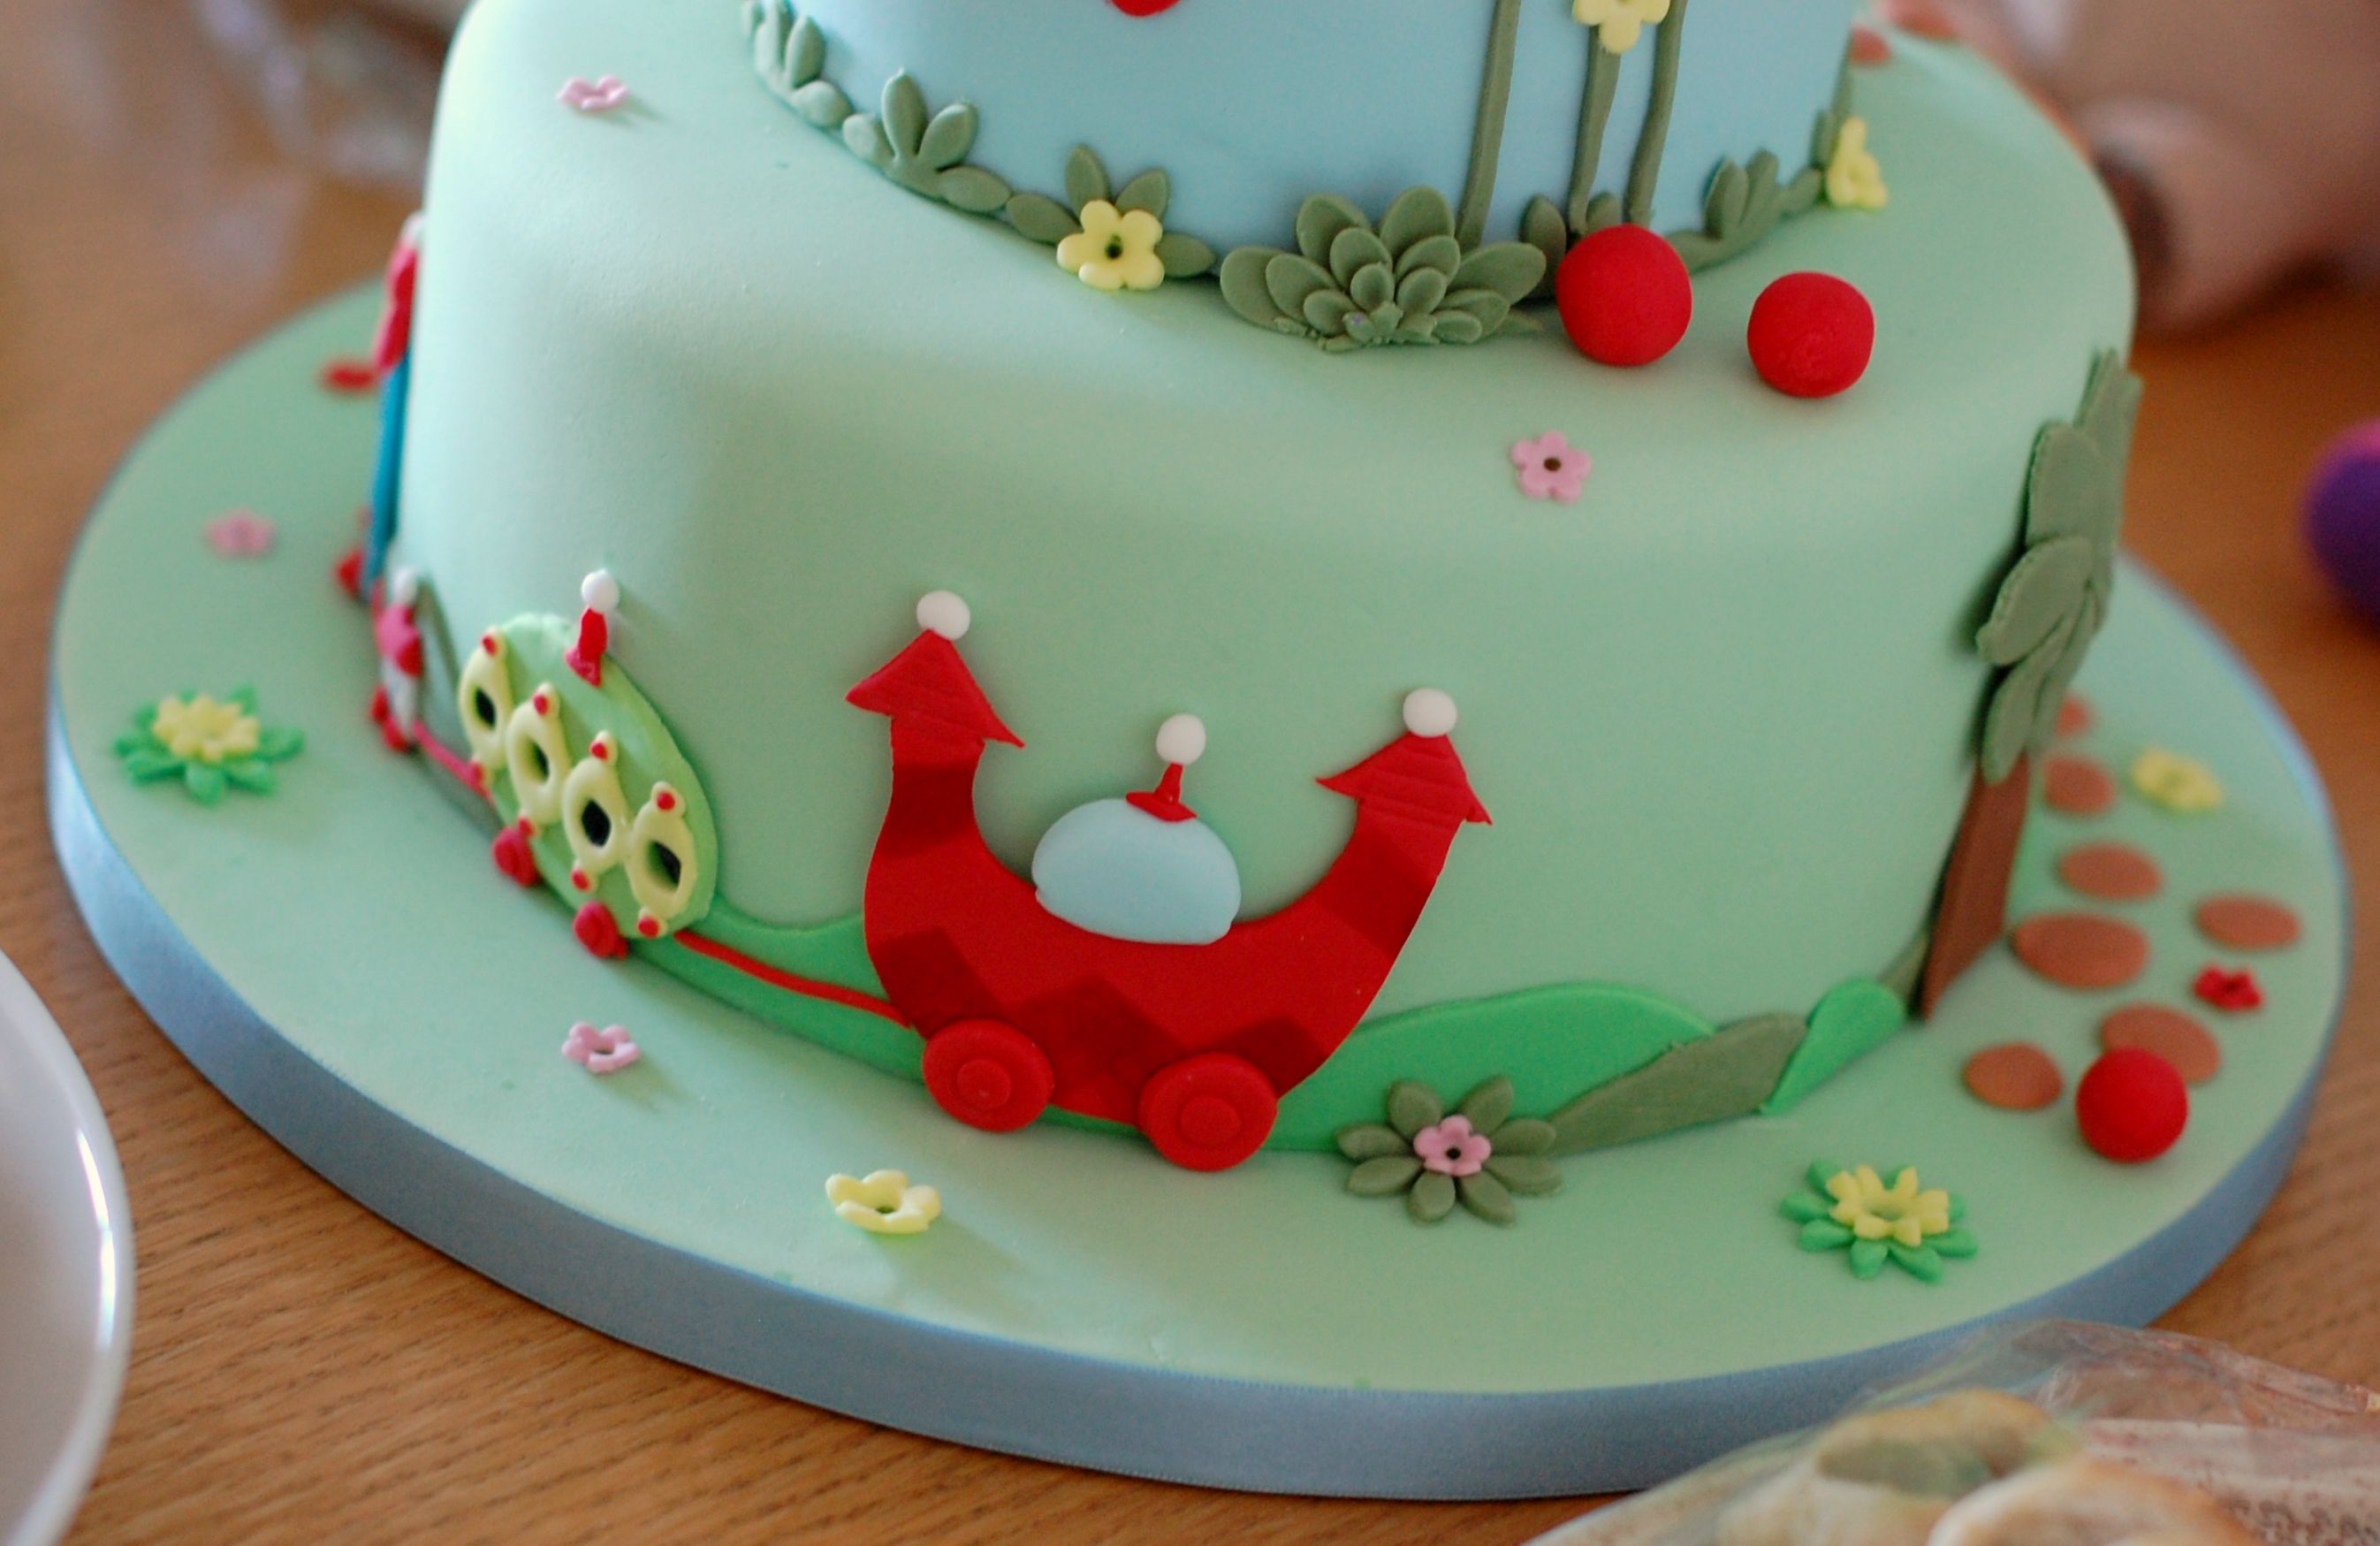 Ninky Nonk - In The Night Garden birthday cake. | September 26 ...